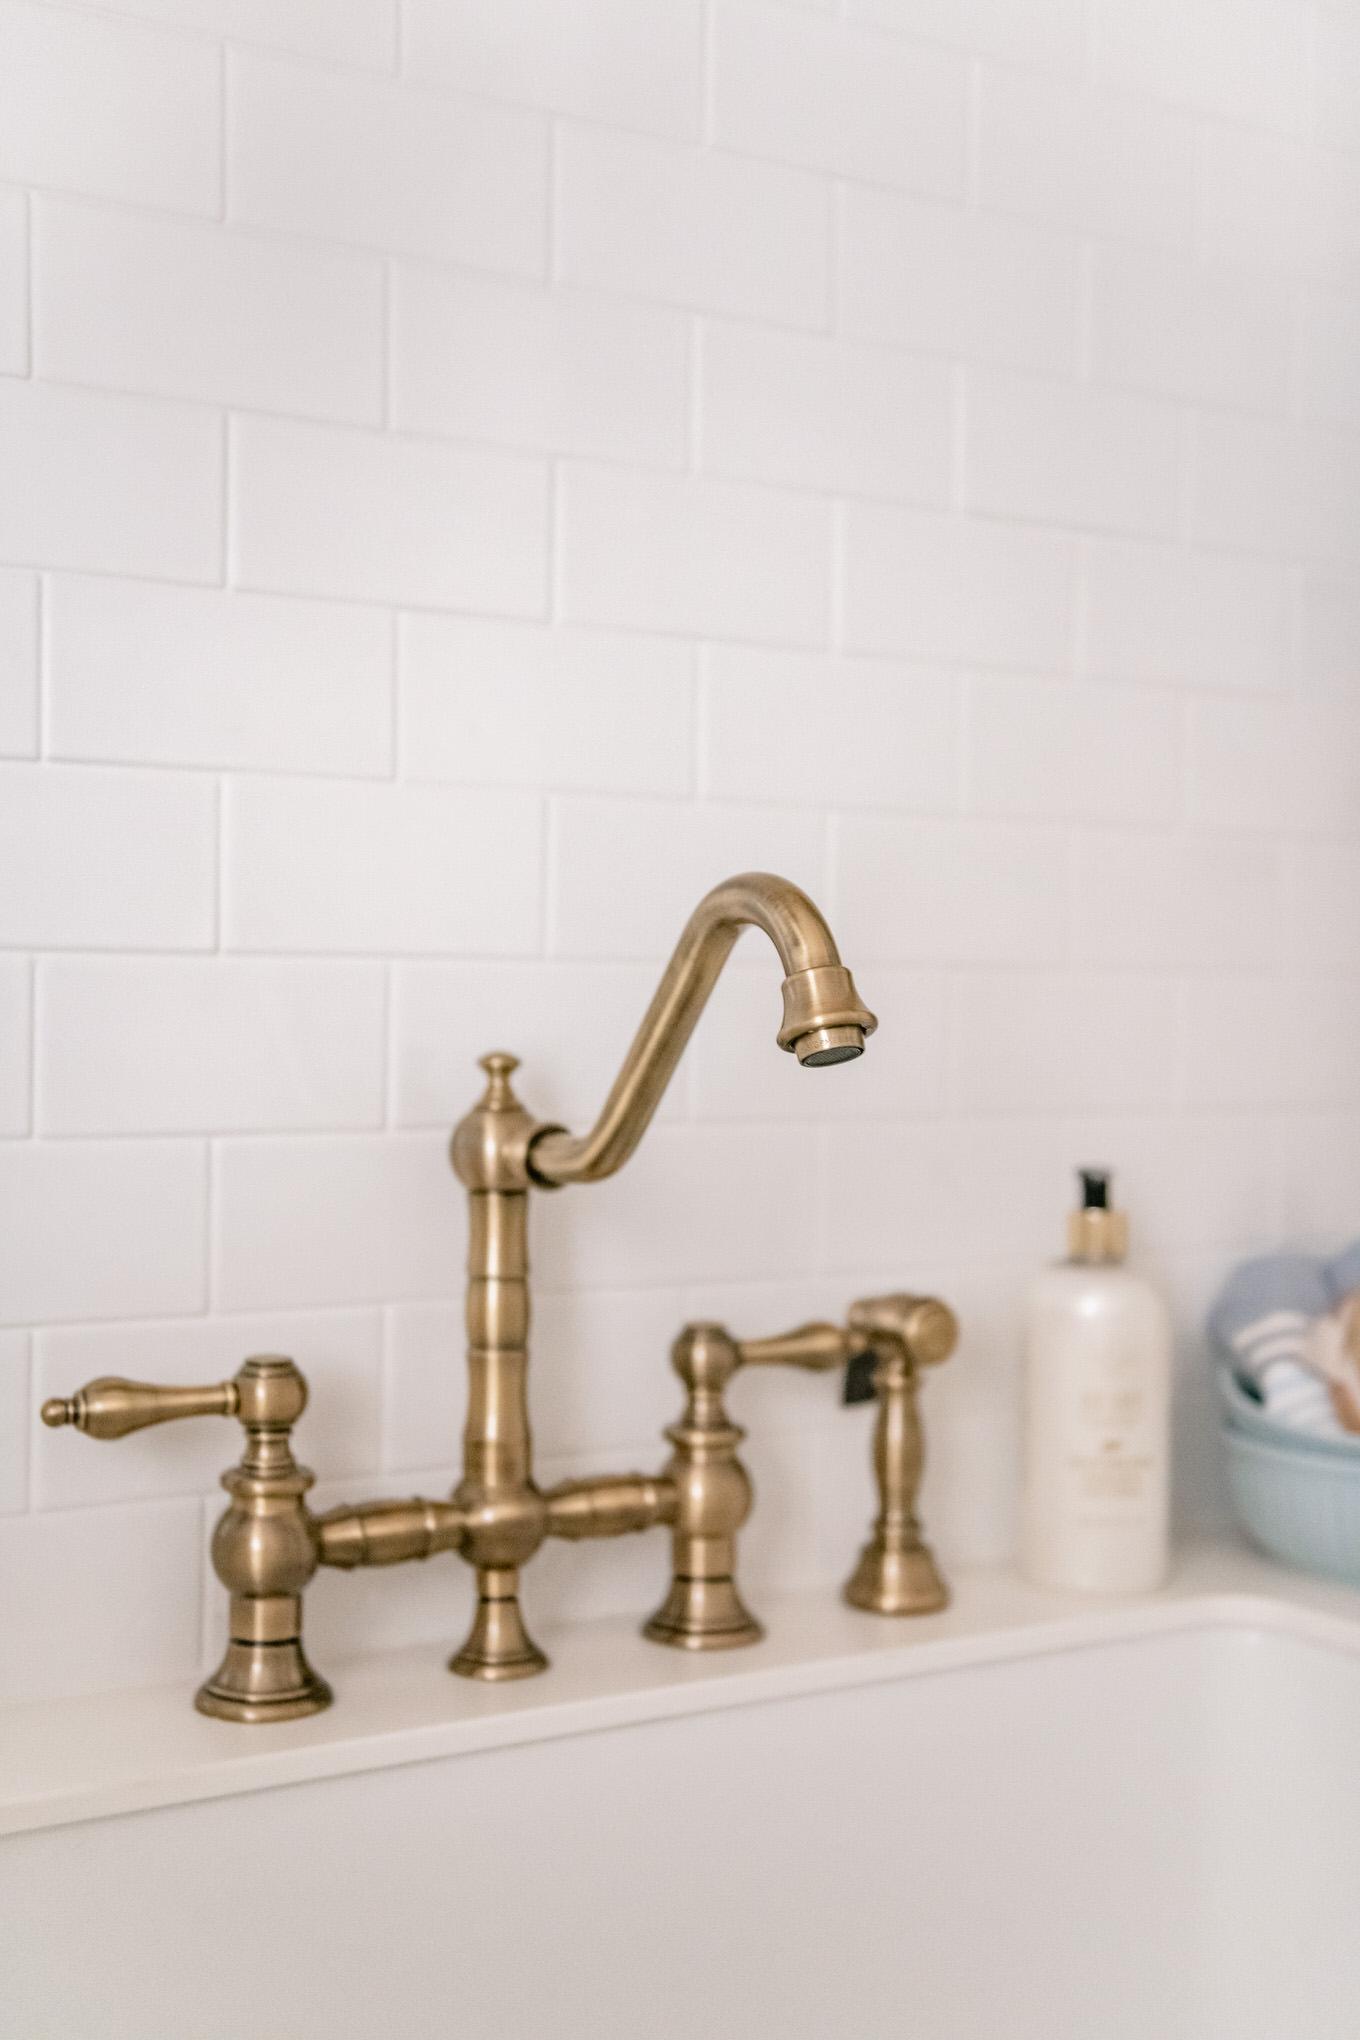 gold sink fixture